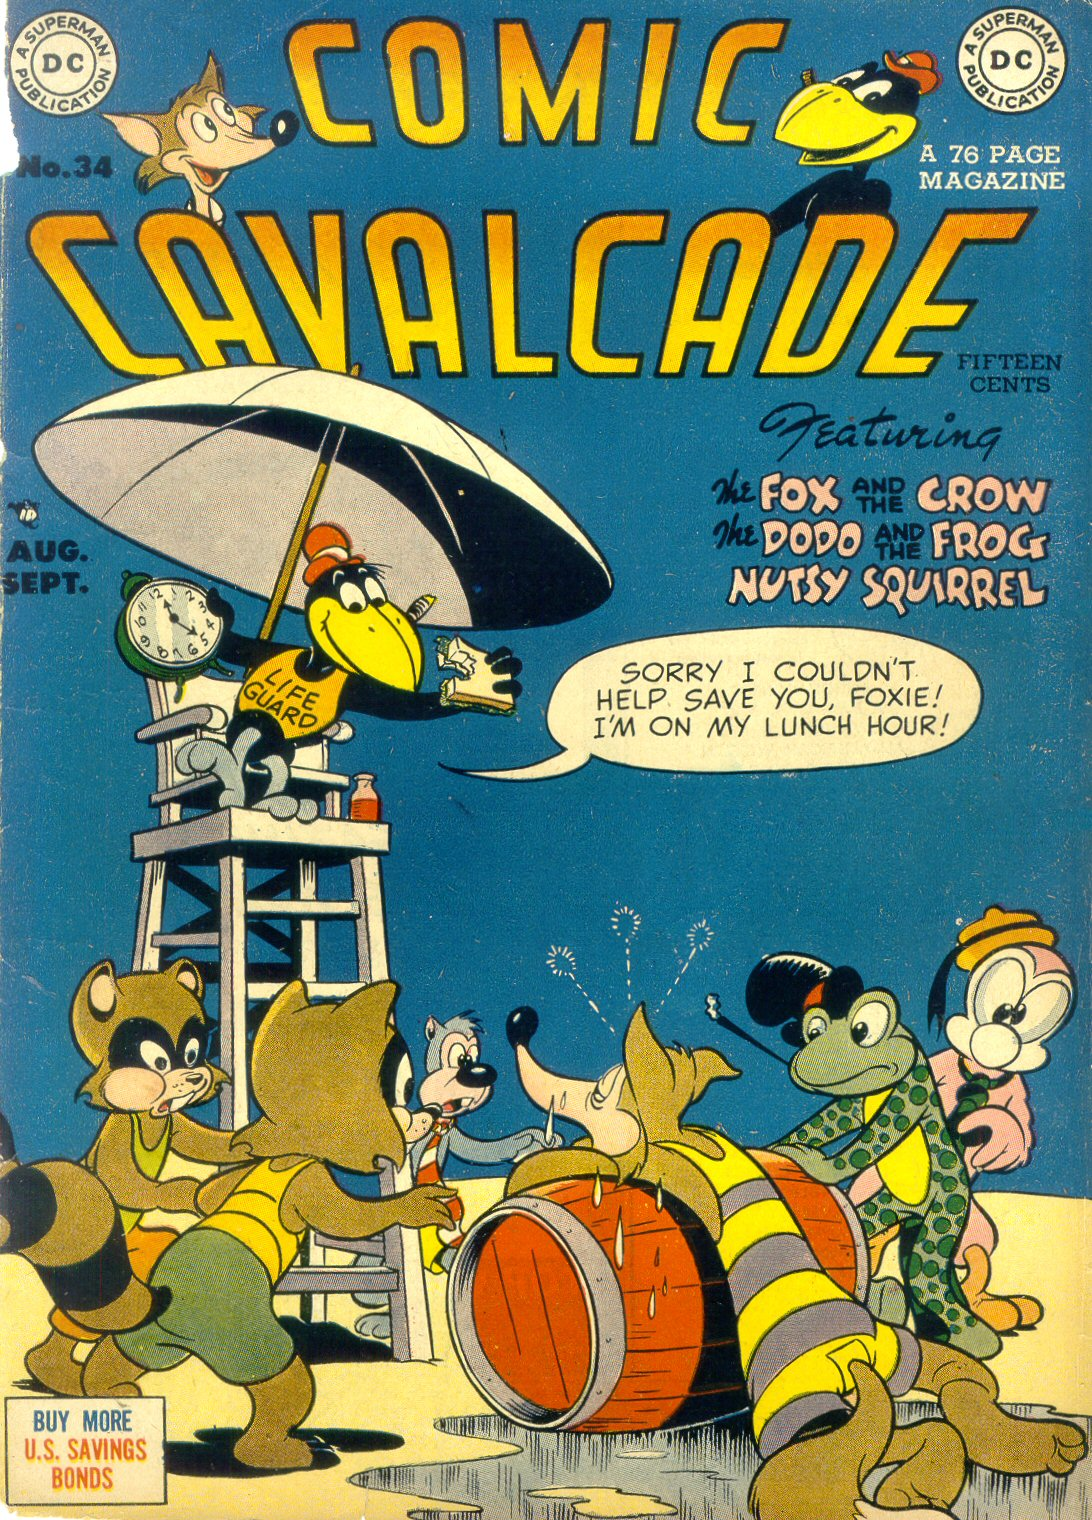 Comic Cavalcade issue 34 - Page 1